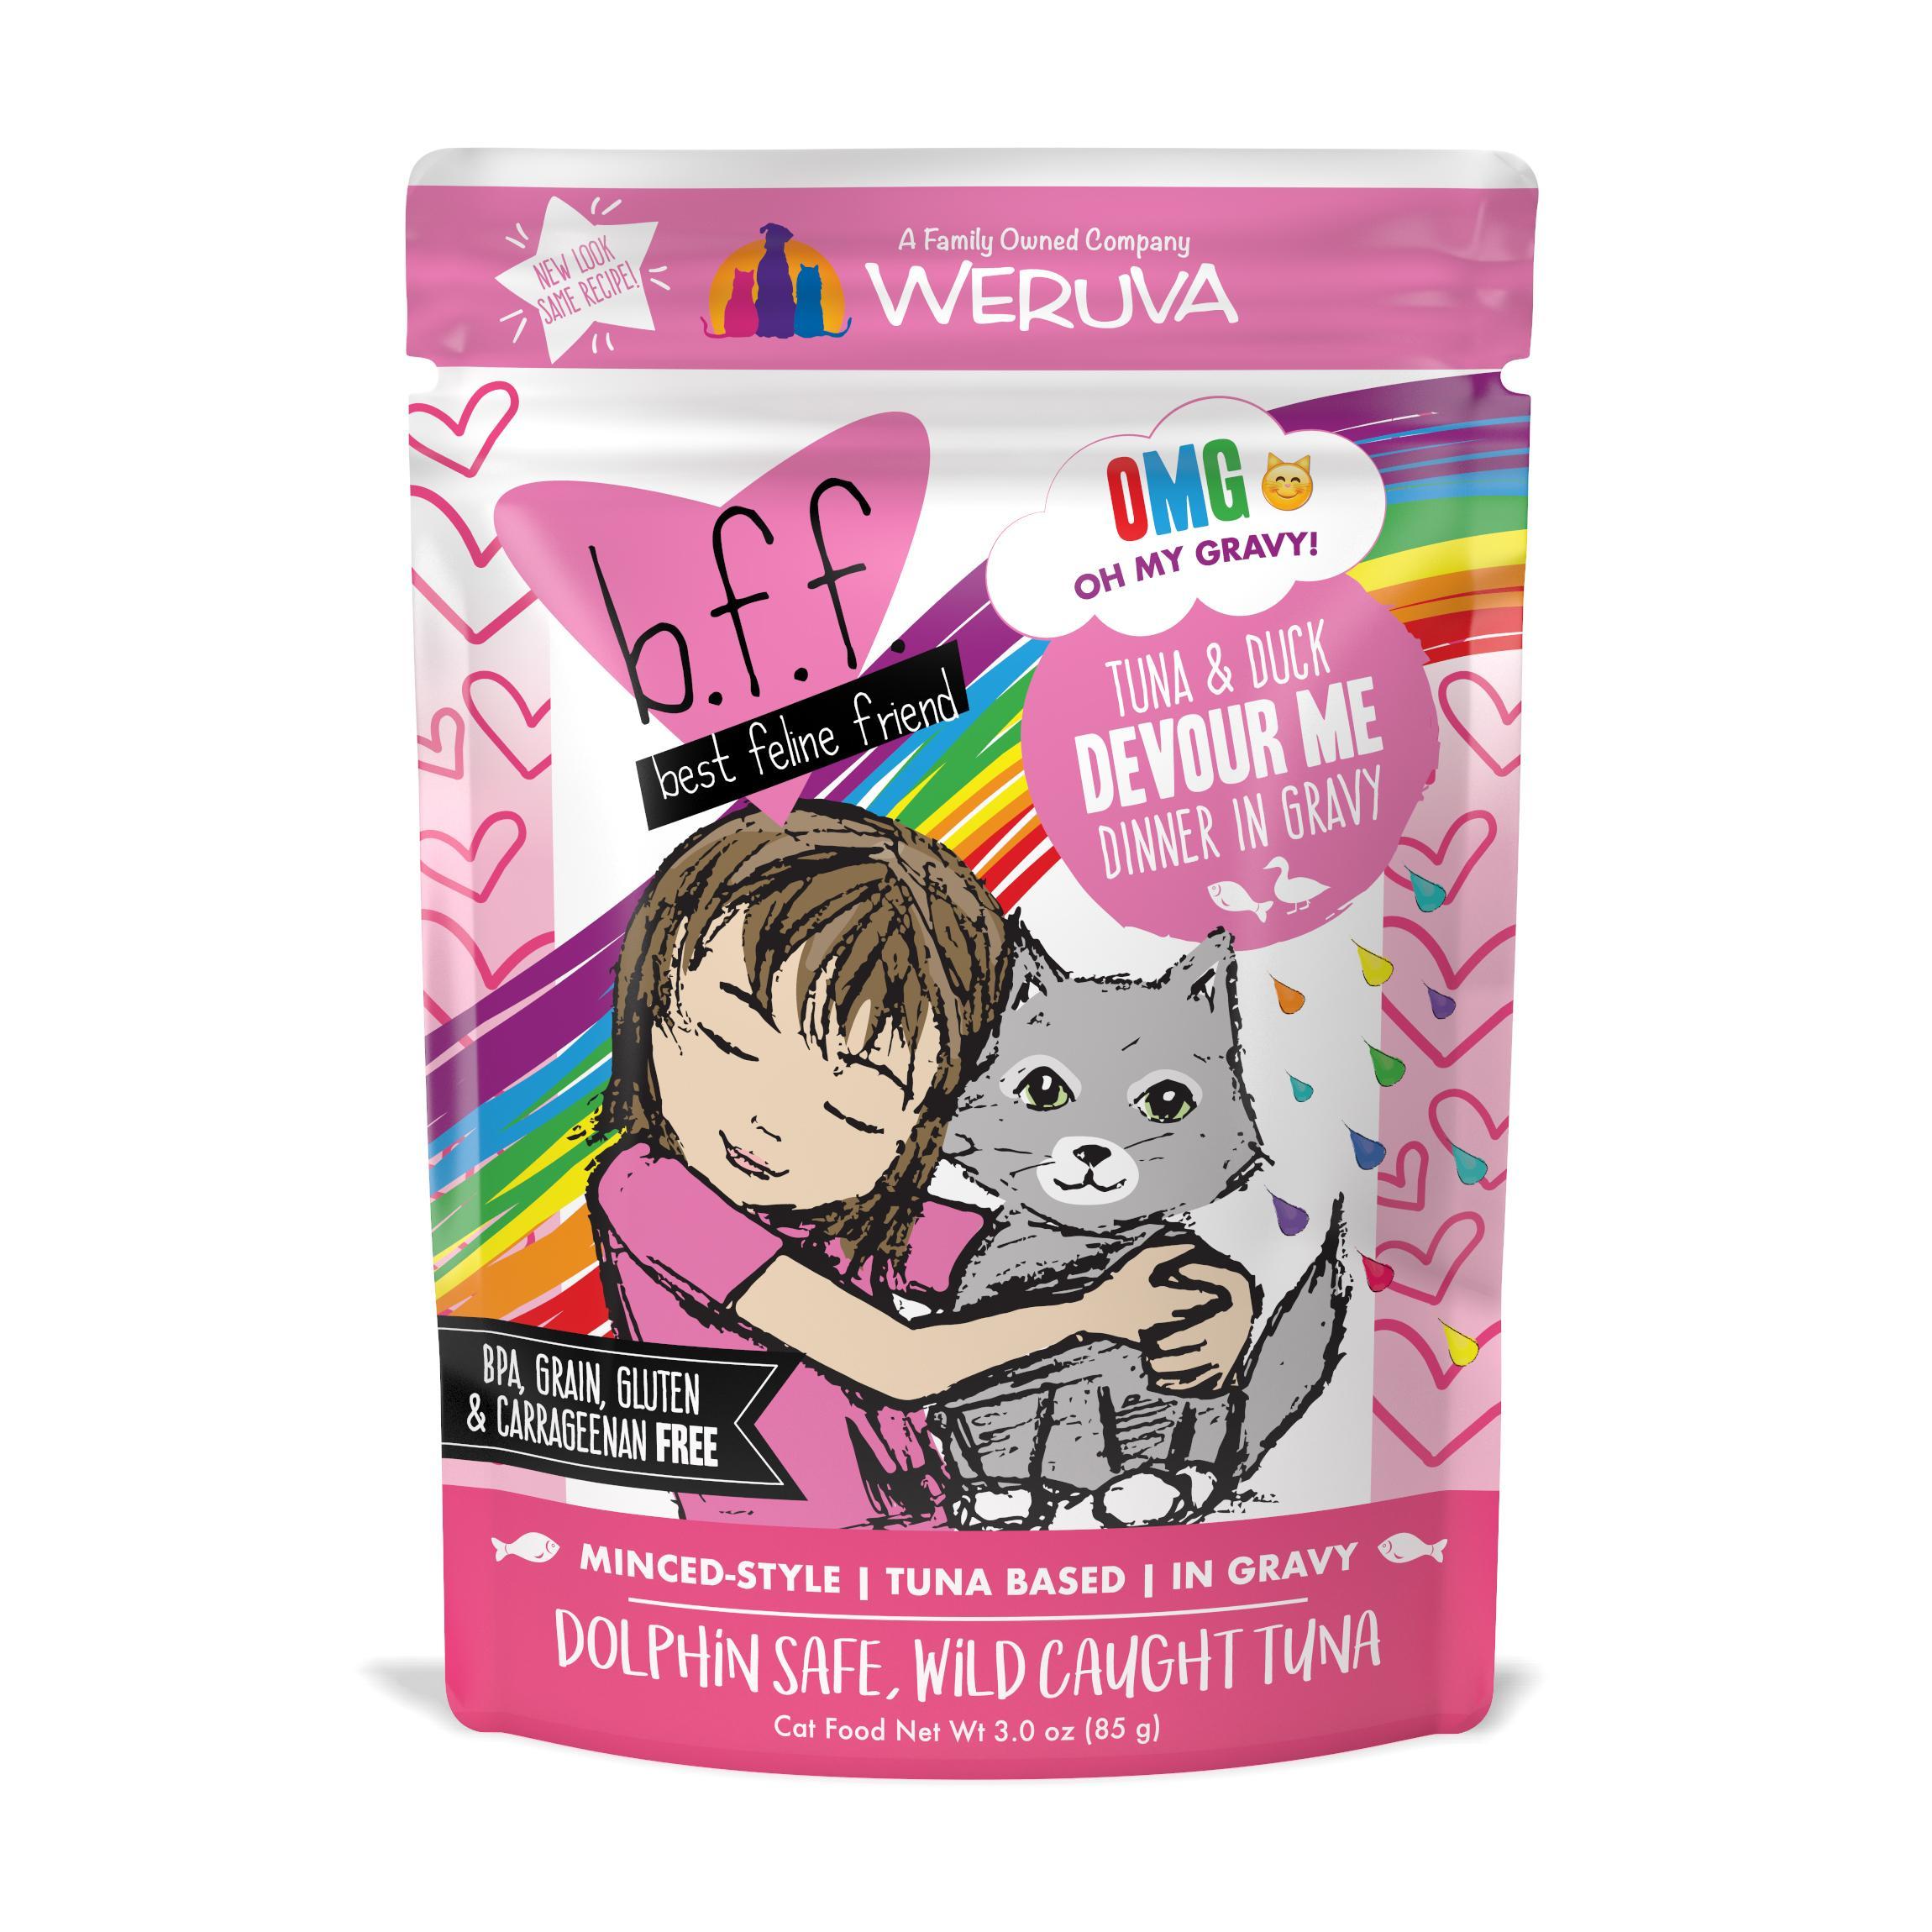 BFF Oh My Gravy! Devour Me Tuna & Duck Dinner in Gravy Grain-Free Wet Cat Food Image